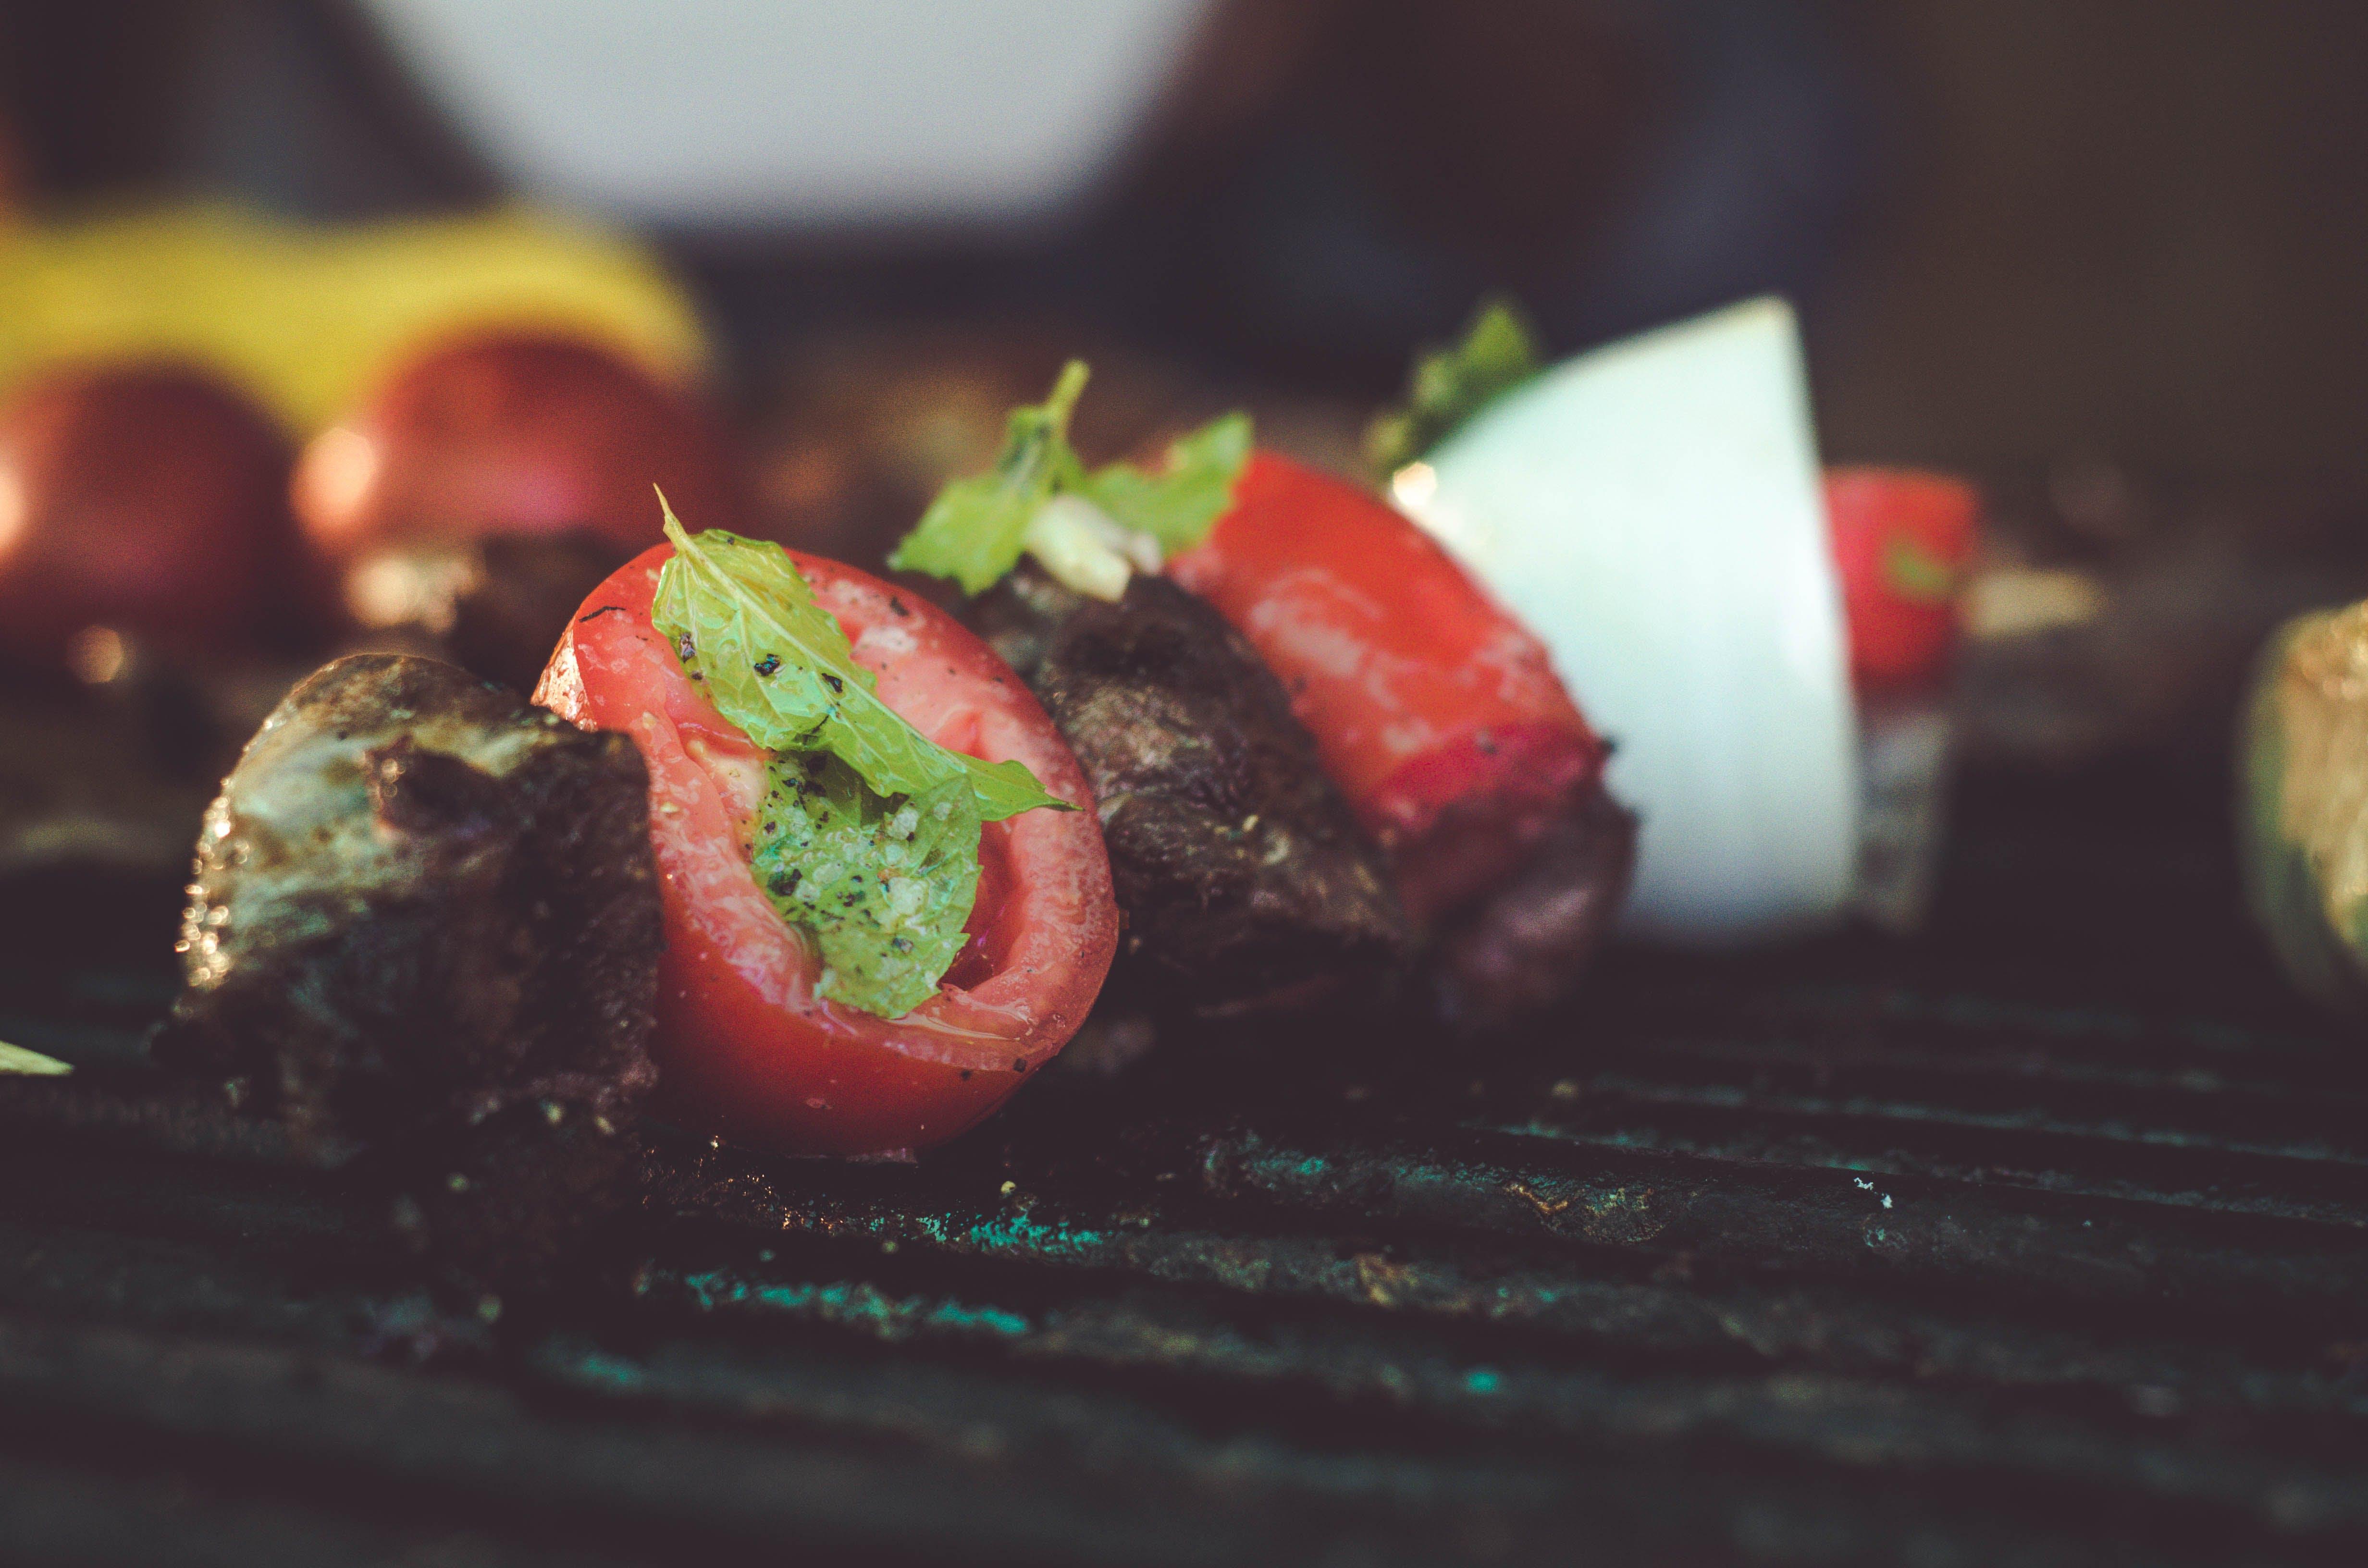 Kebab on Black Metal Grill